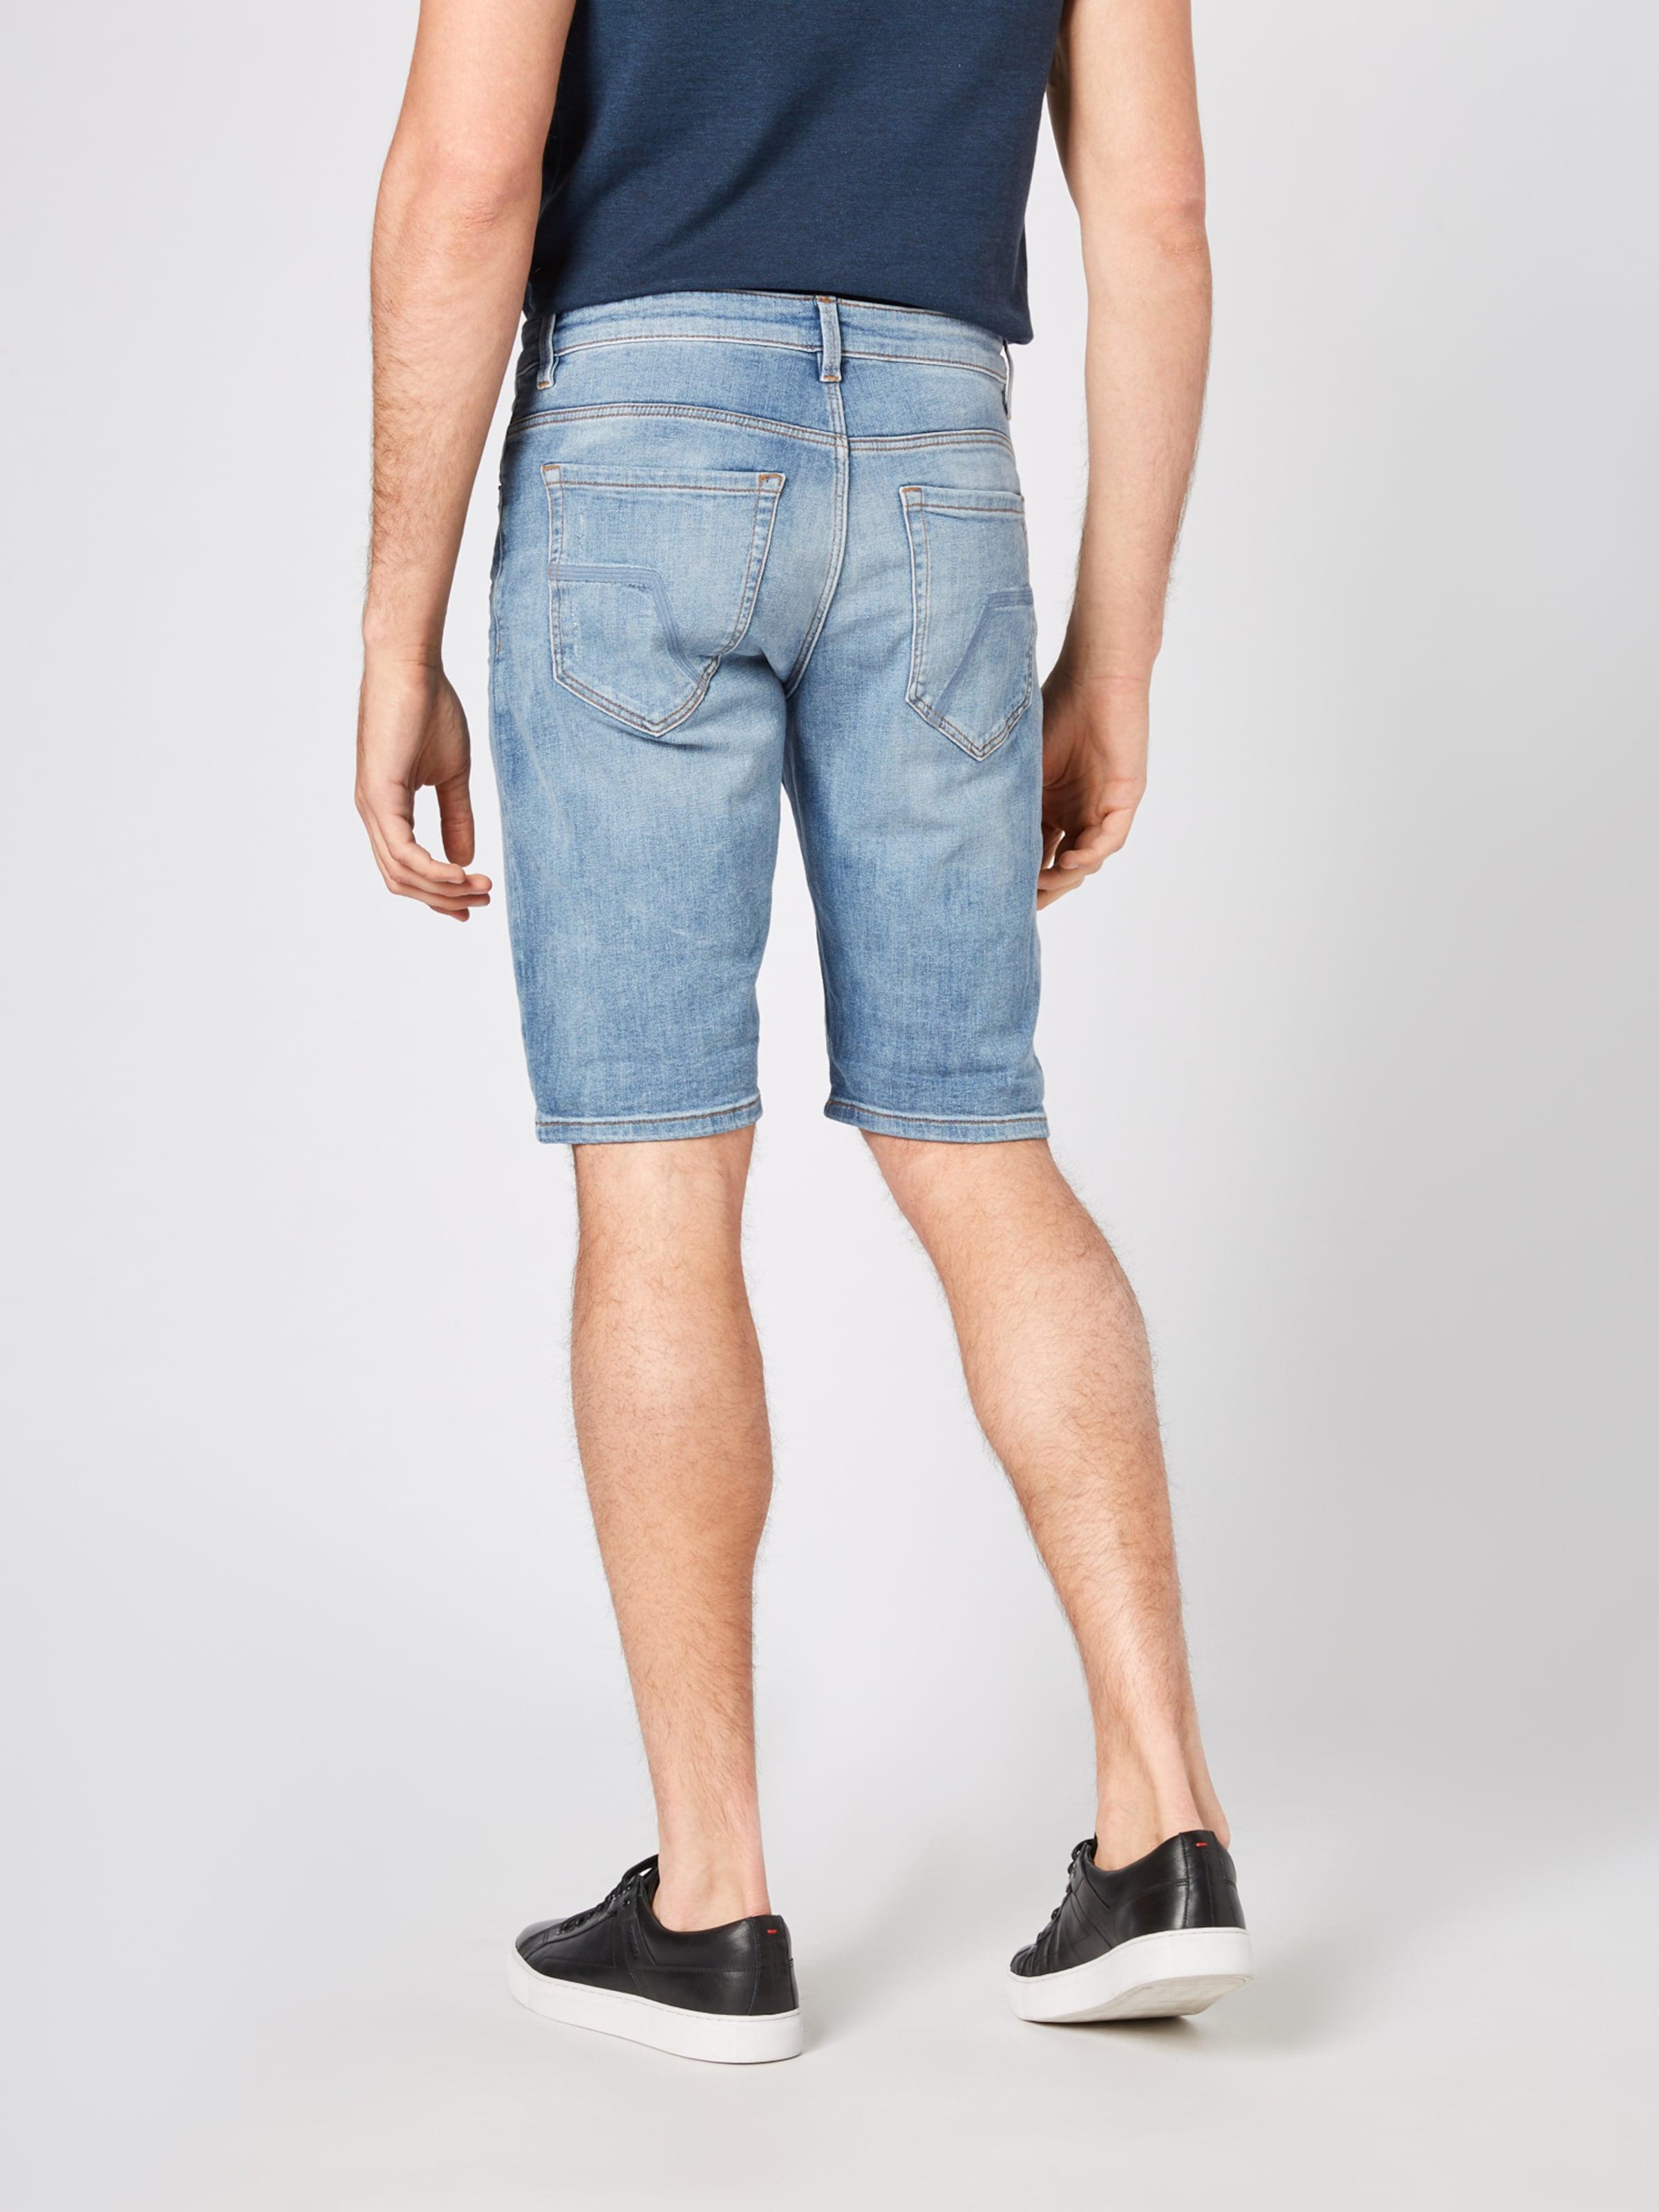 Designed Bleu Denim Q Jean s By En ALRjq354